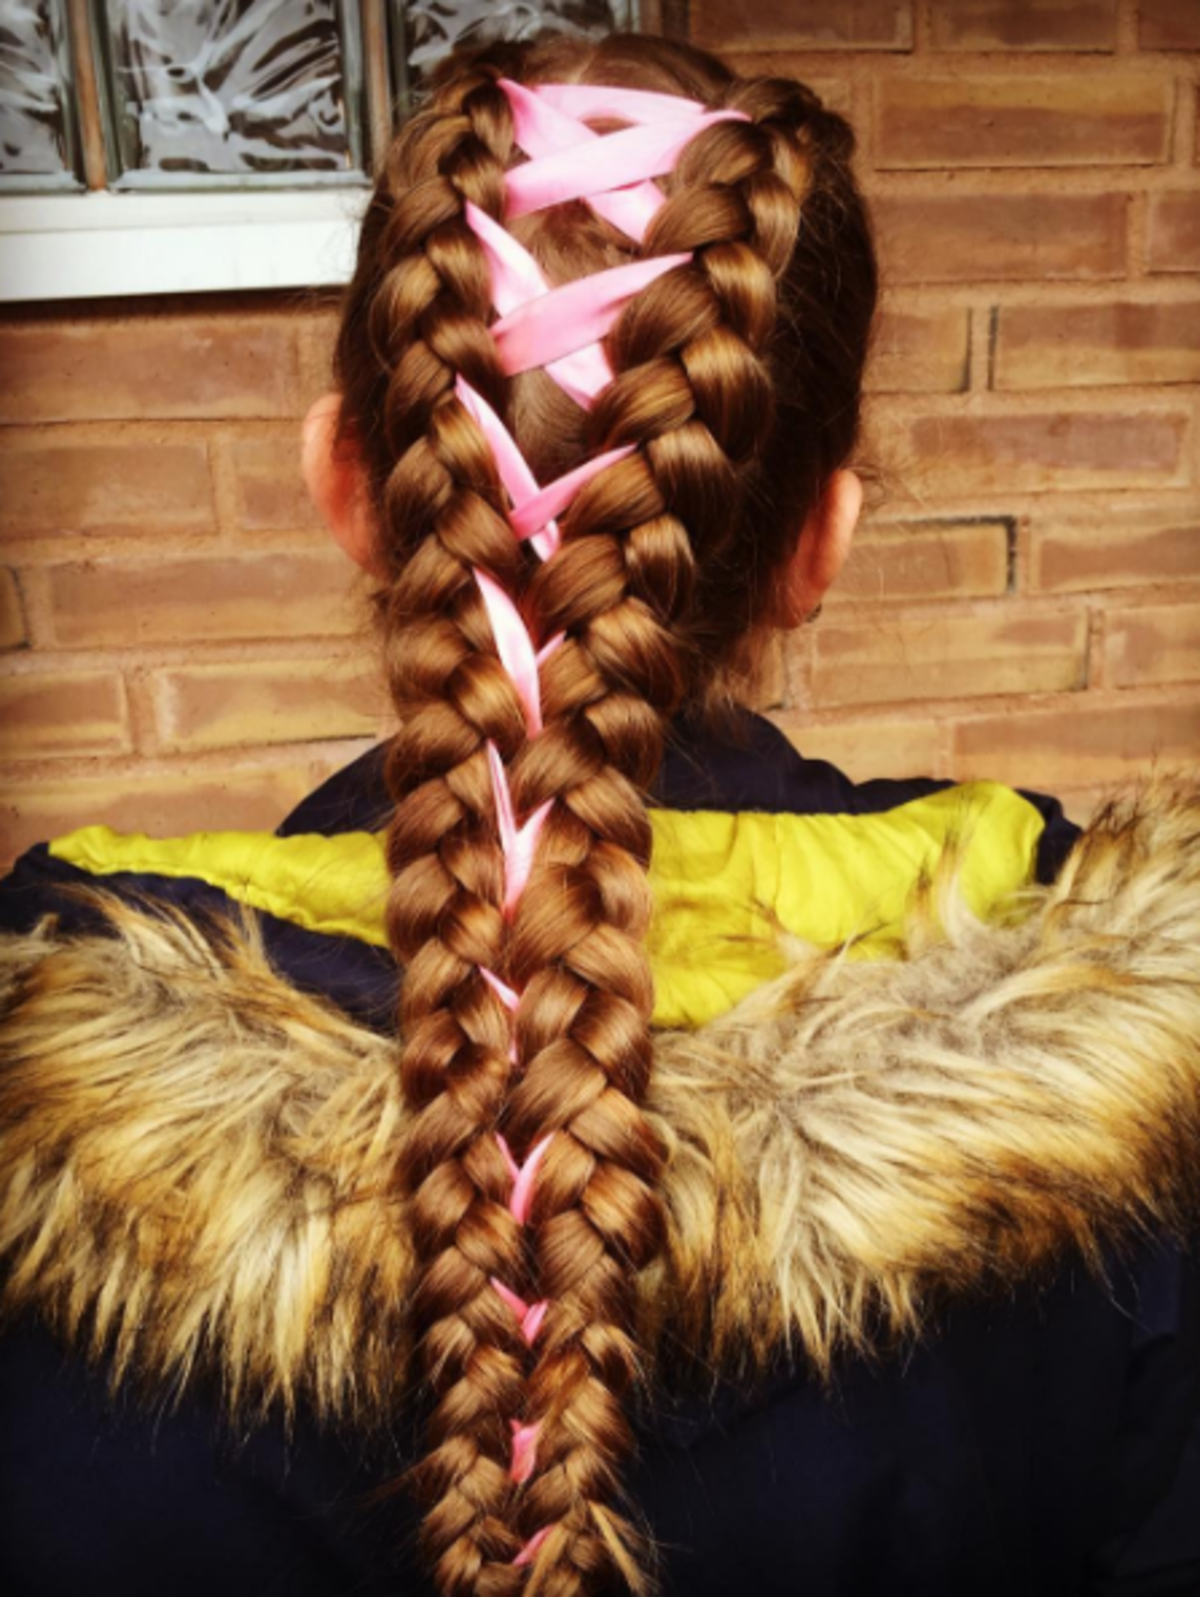 Zdjęcie: Instagram.com/norwegian_hairstyles